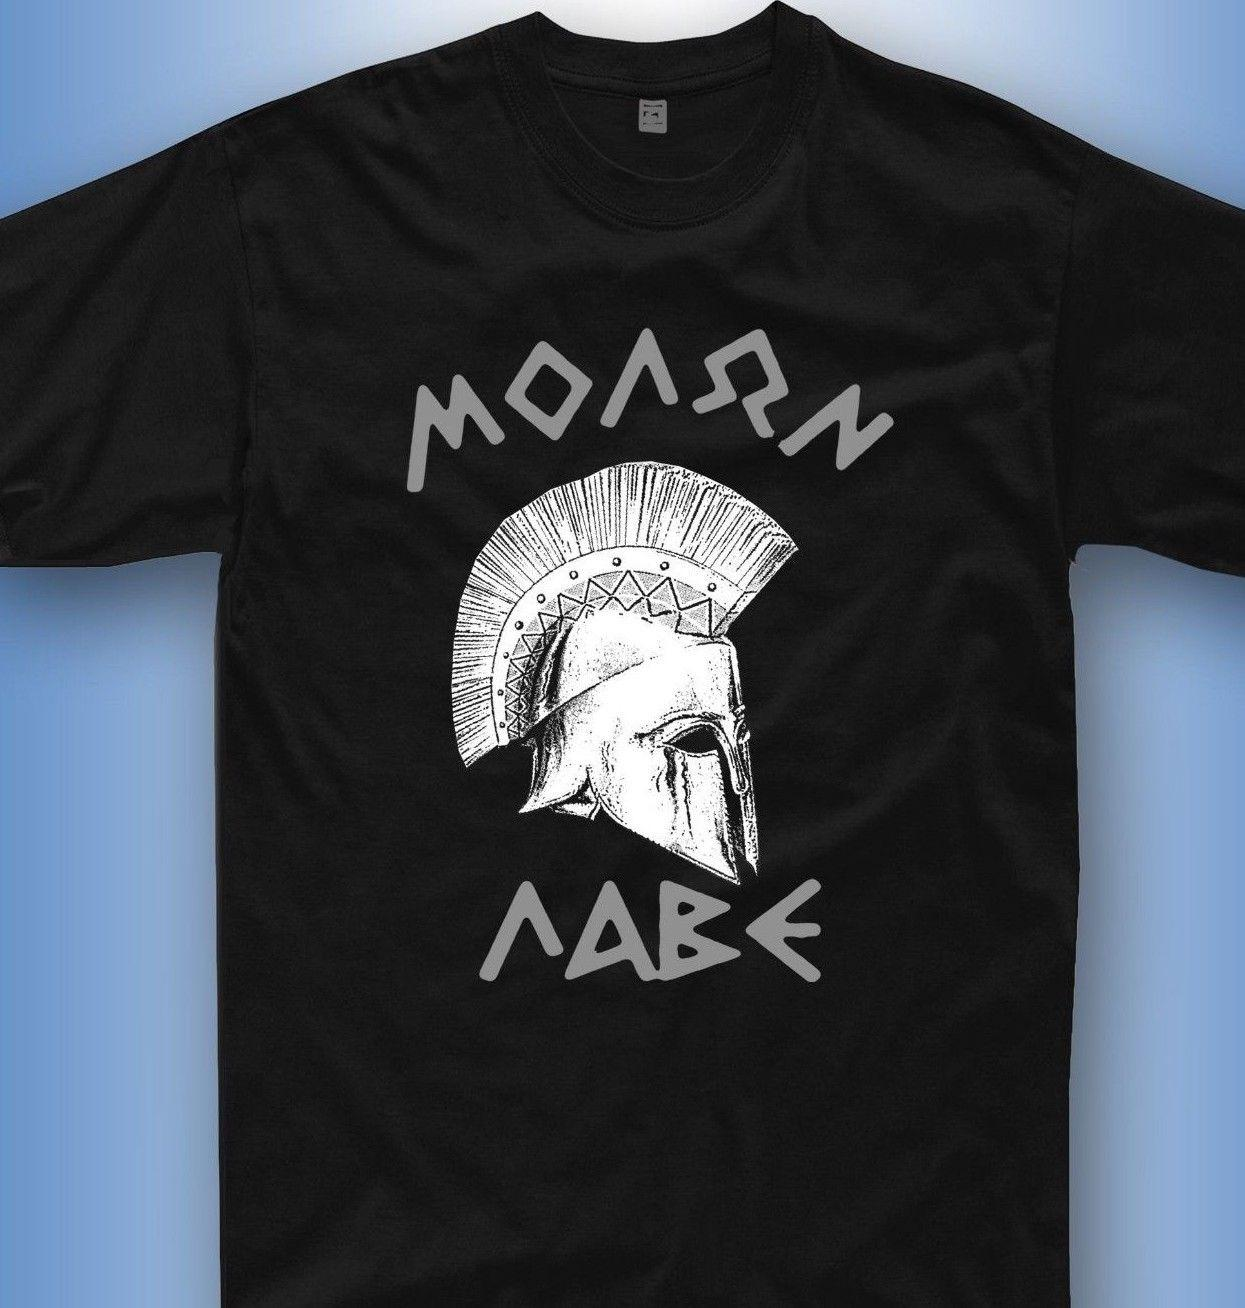 Molon Lave T Shirt Sparta Spartaner Krieger Gym Greece Griechenland Tshirt  T Shirts Best Best Funny Shirts From Happytshirt53,  11.58  DHgate.Com 876058ee94